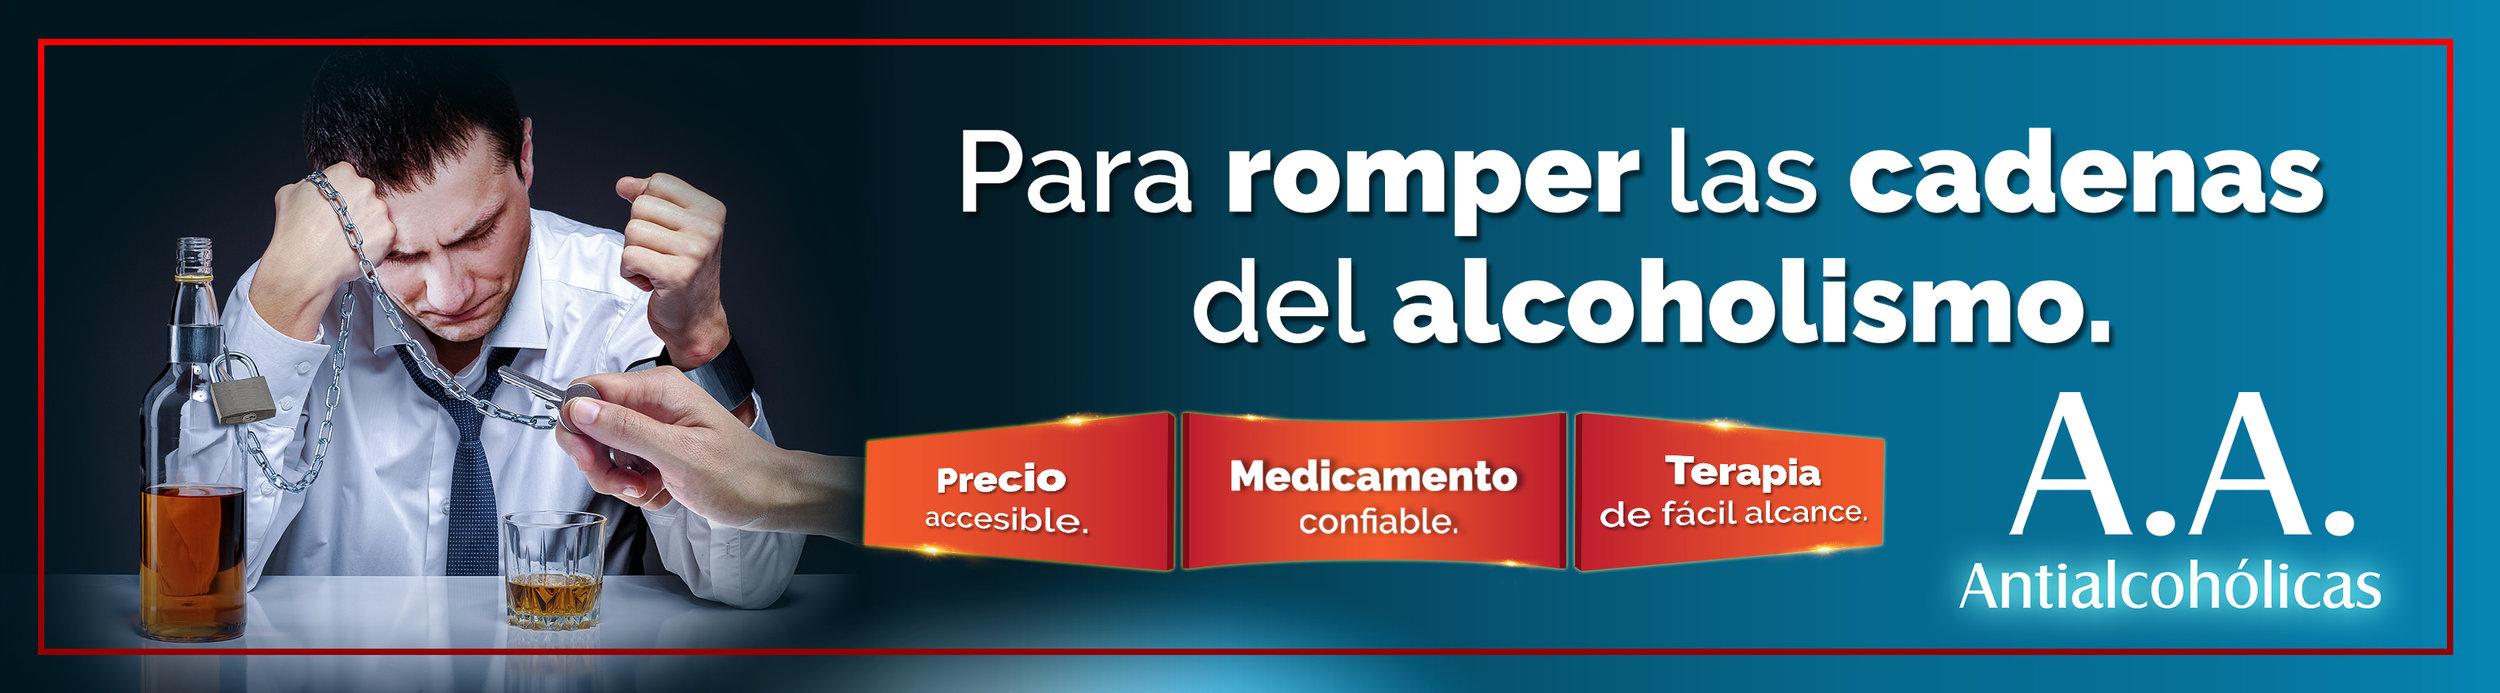 Banner Antialcoholicas.jpg